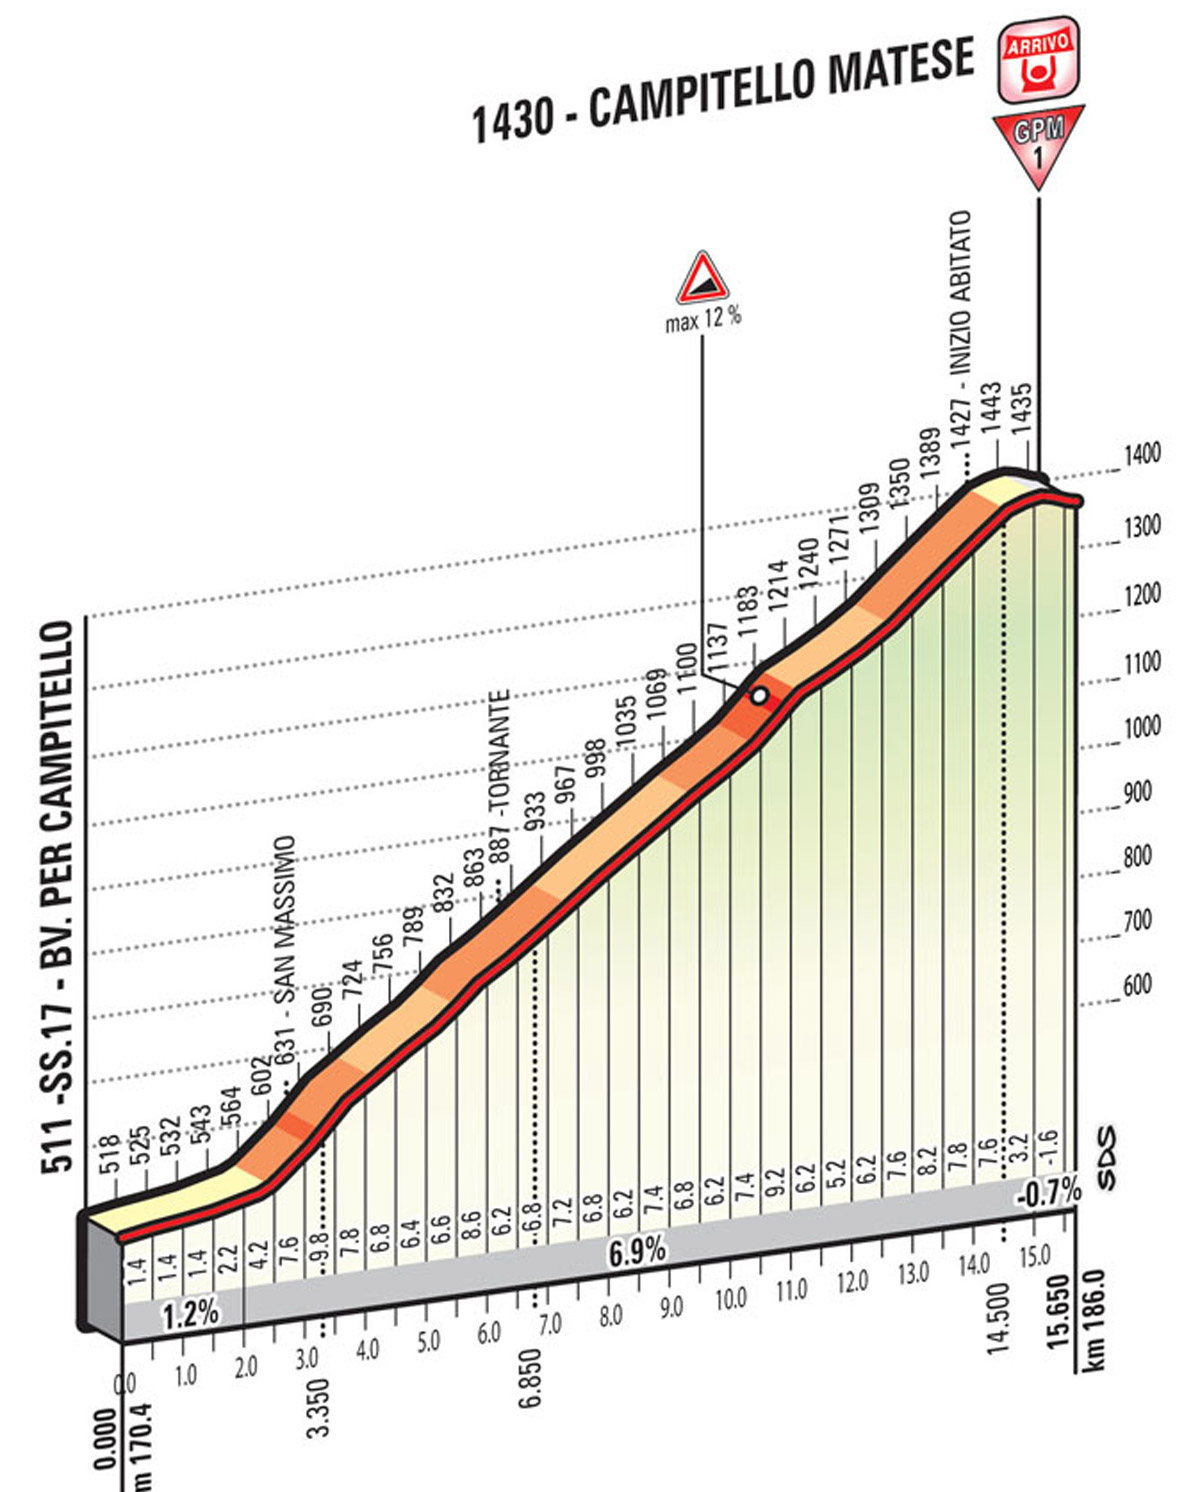 Profil Schlussanstieg Etappe 8 Giro 2015